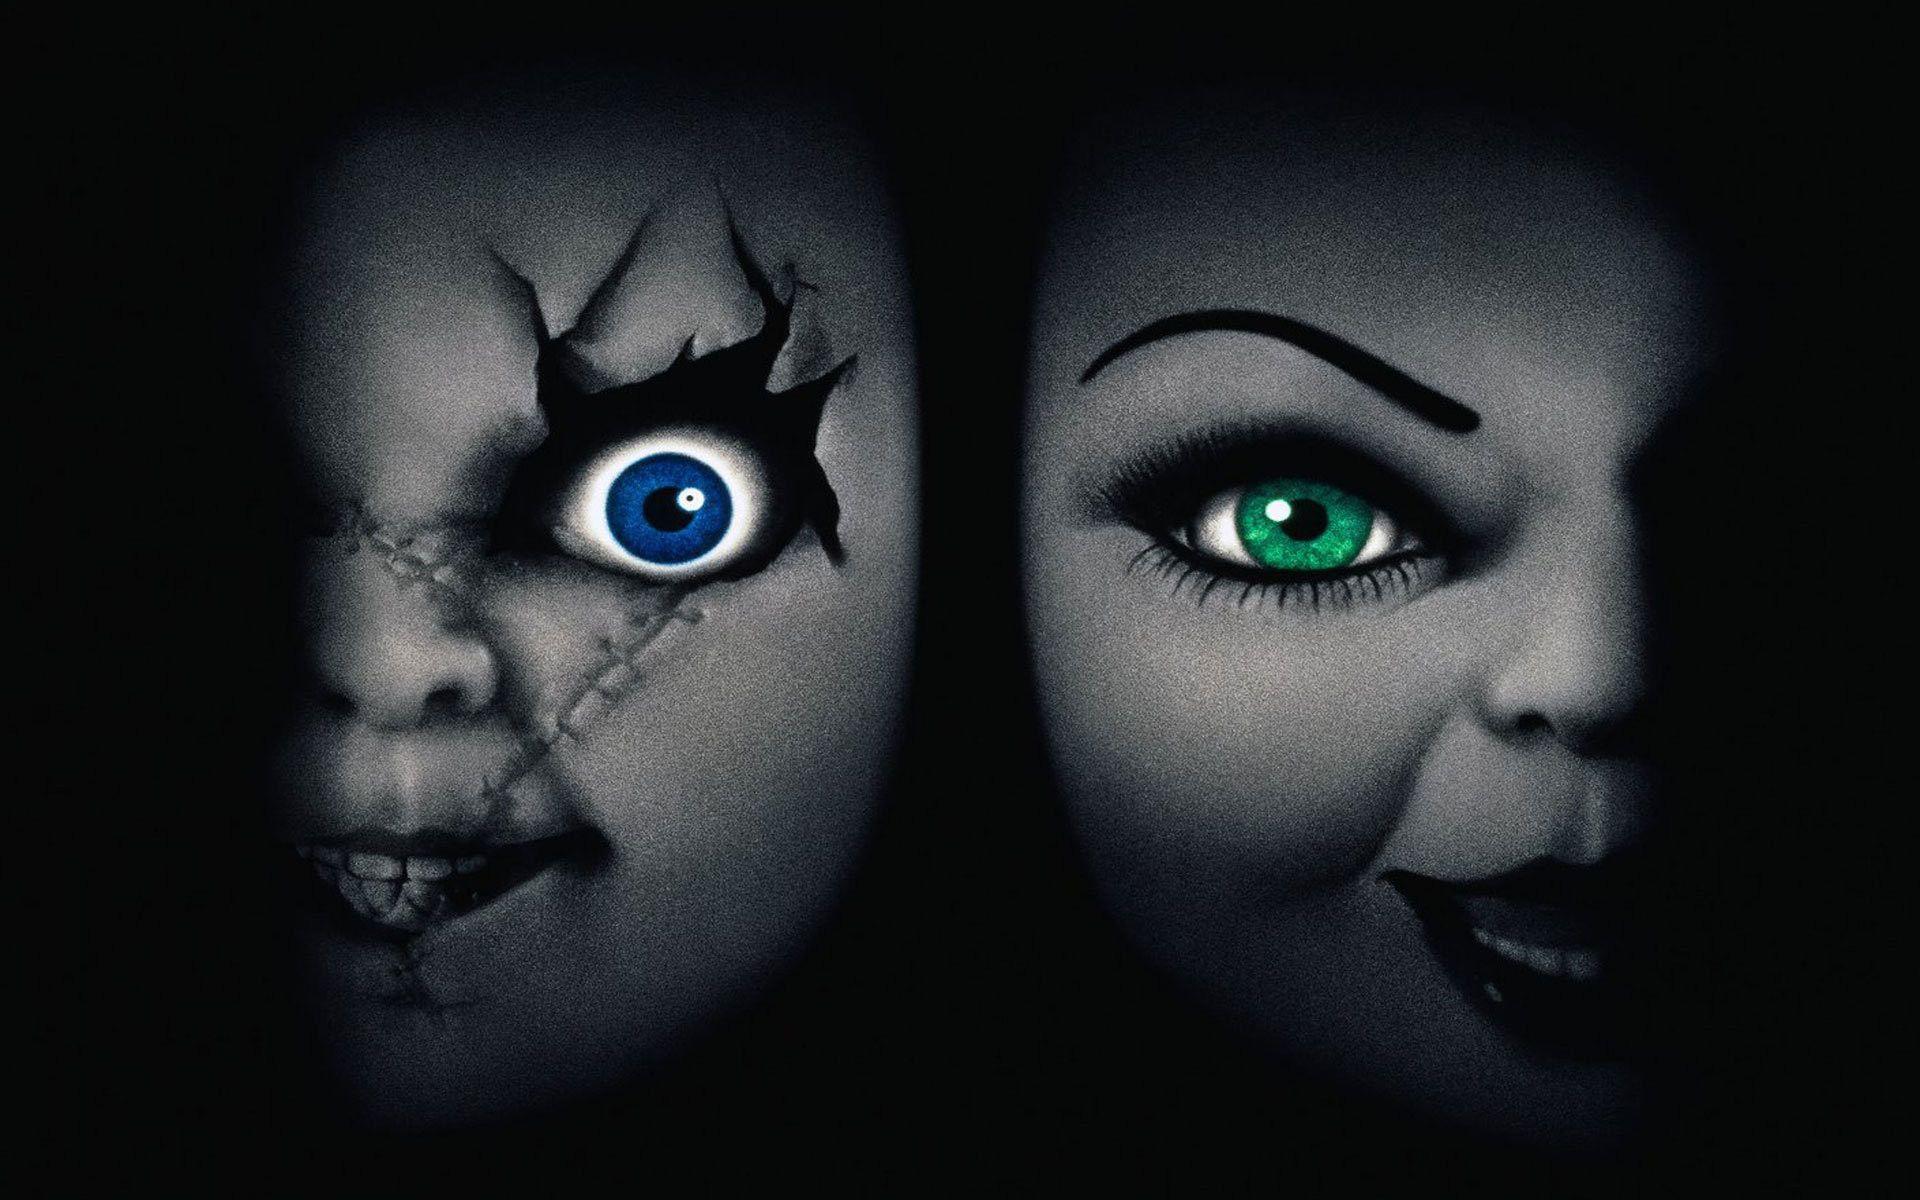 Bride of Chucky Bride of chucky, Chucky, Chucky movies